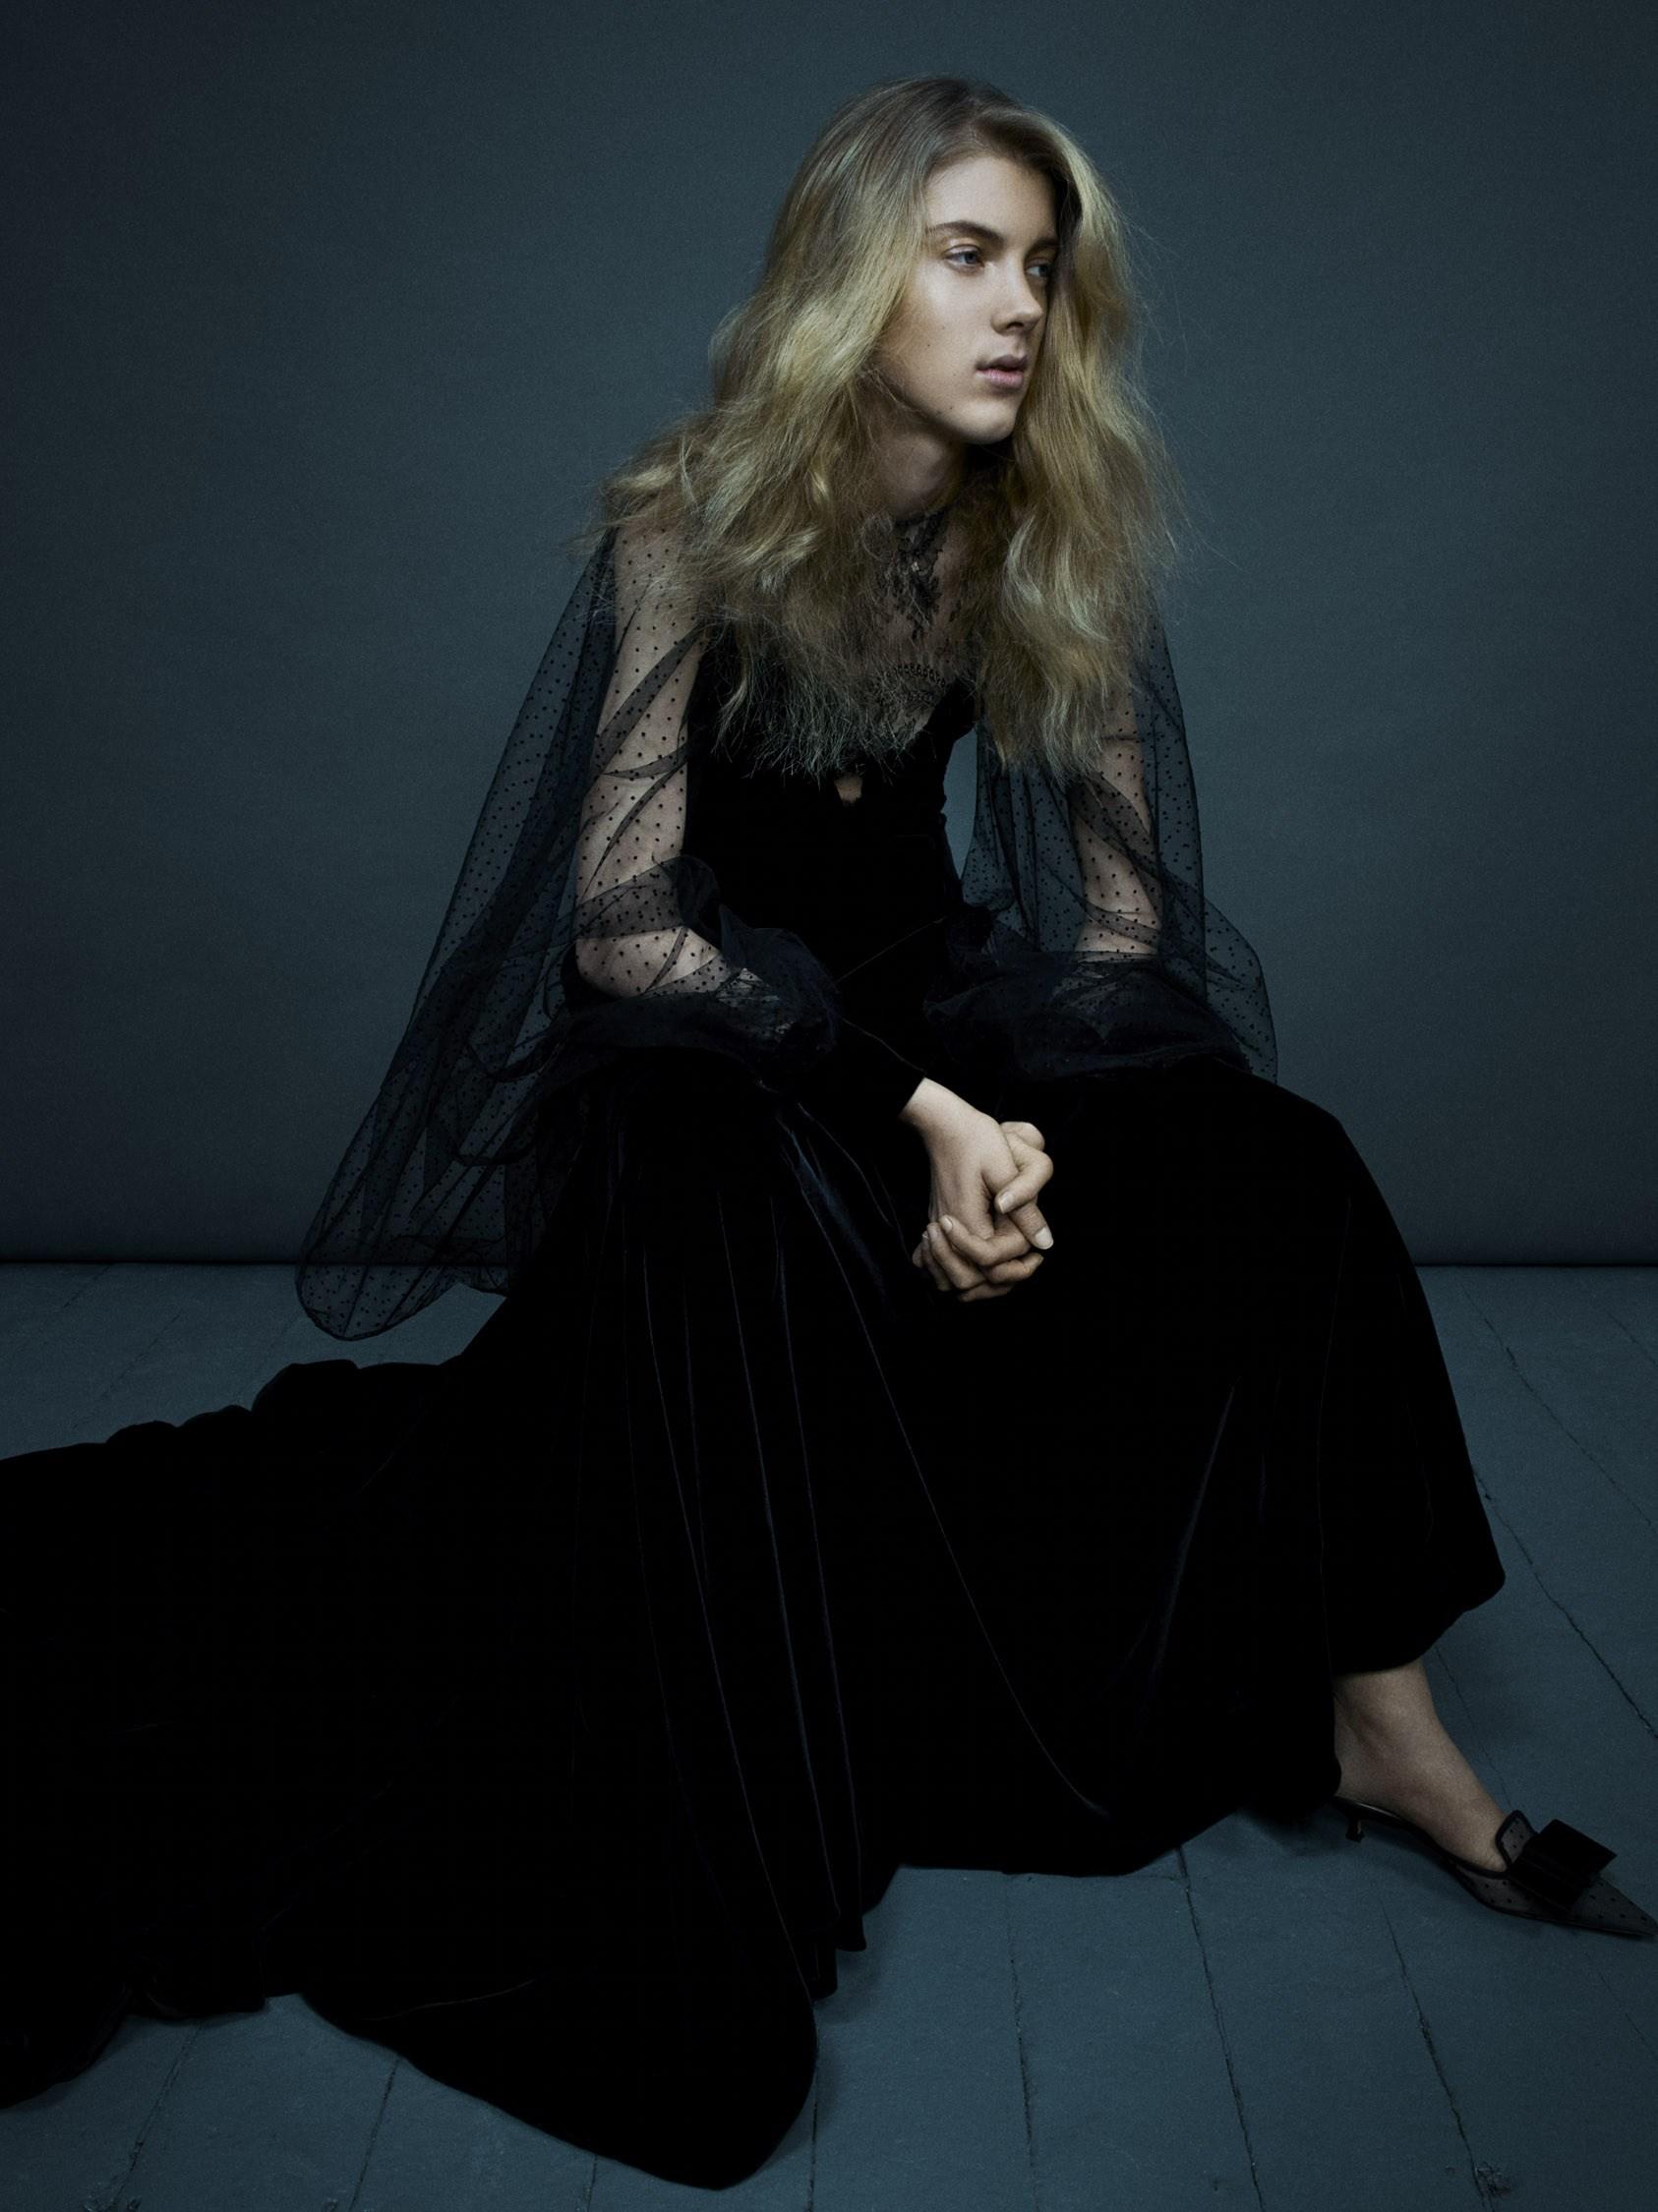 Vogue-Italia-March-2017-Dior-Ally-Ertel-by-Emma-Summerton-07.jpg